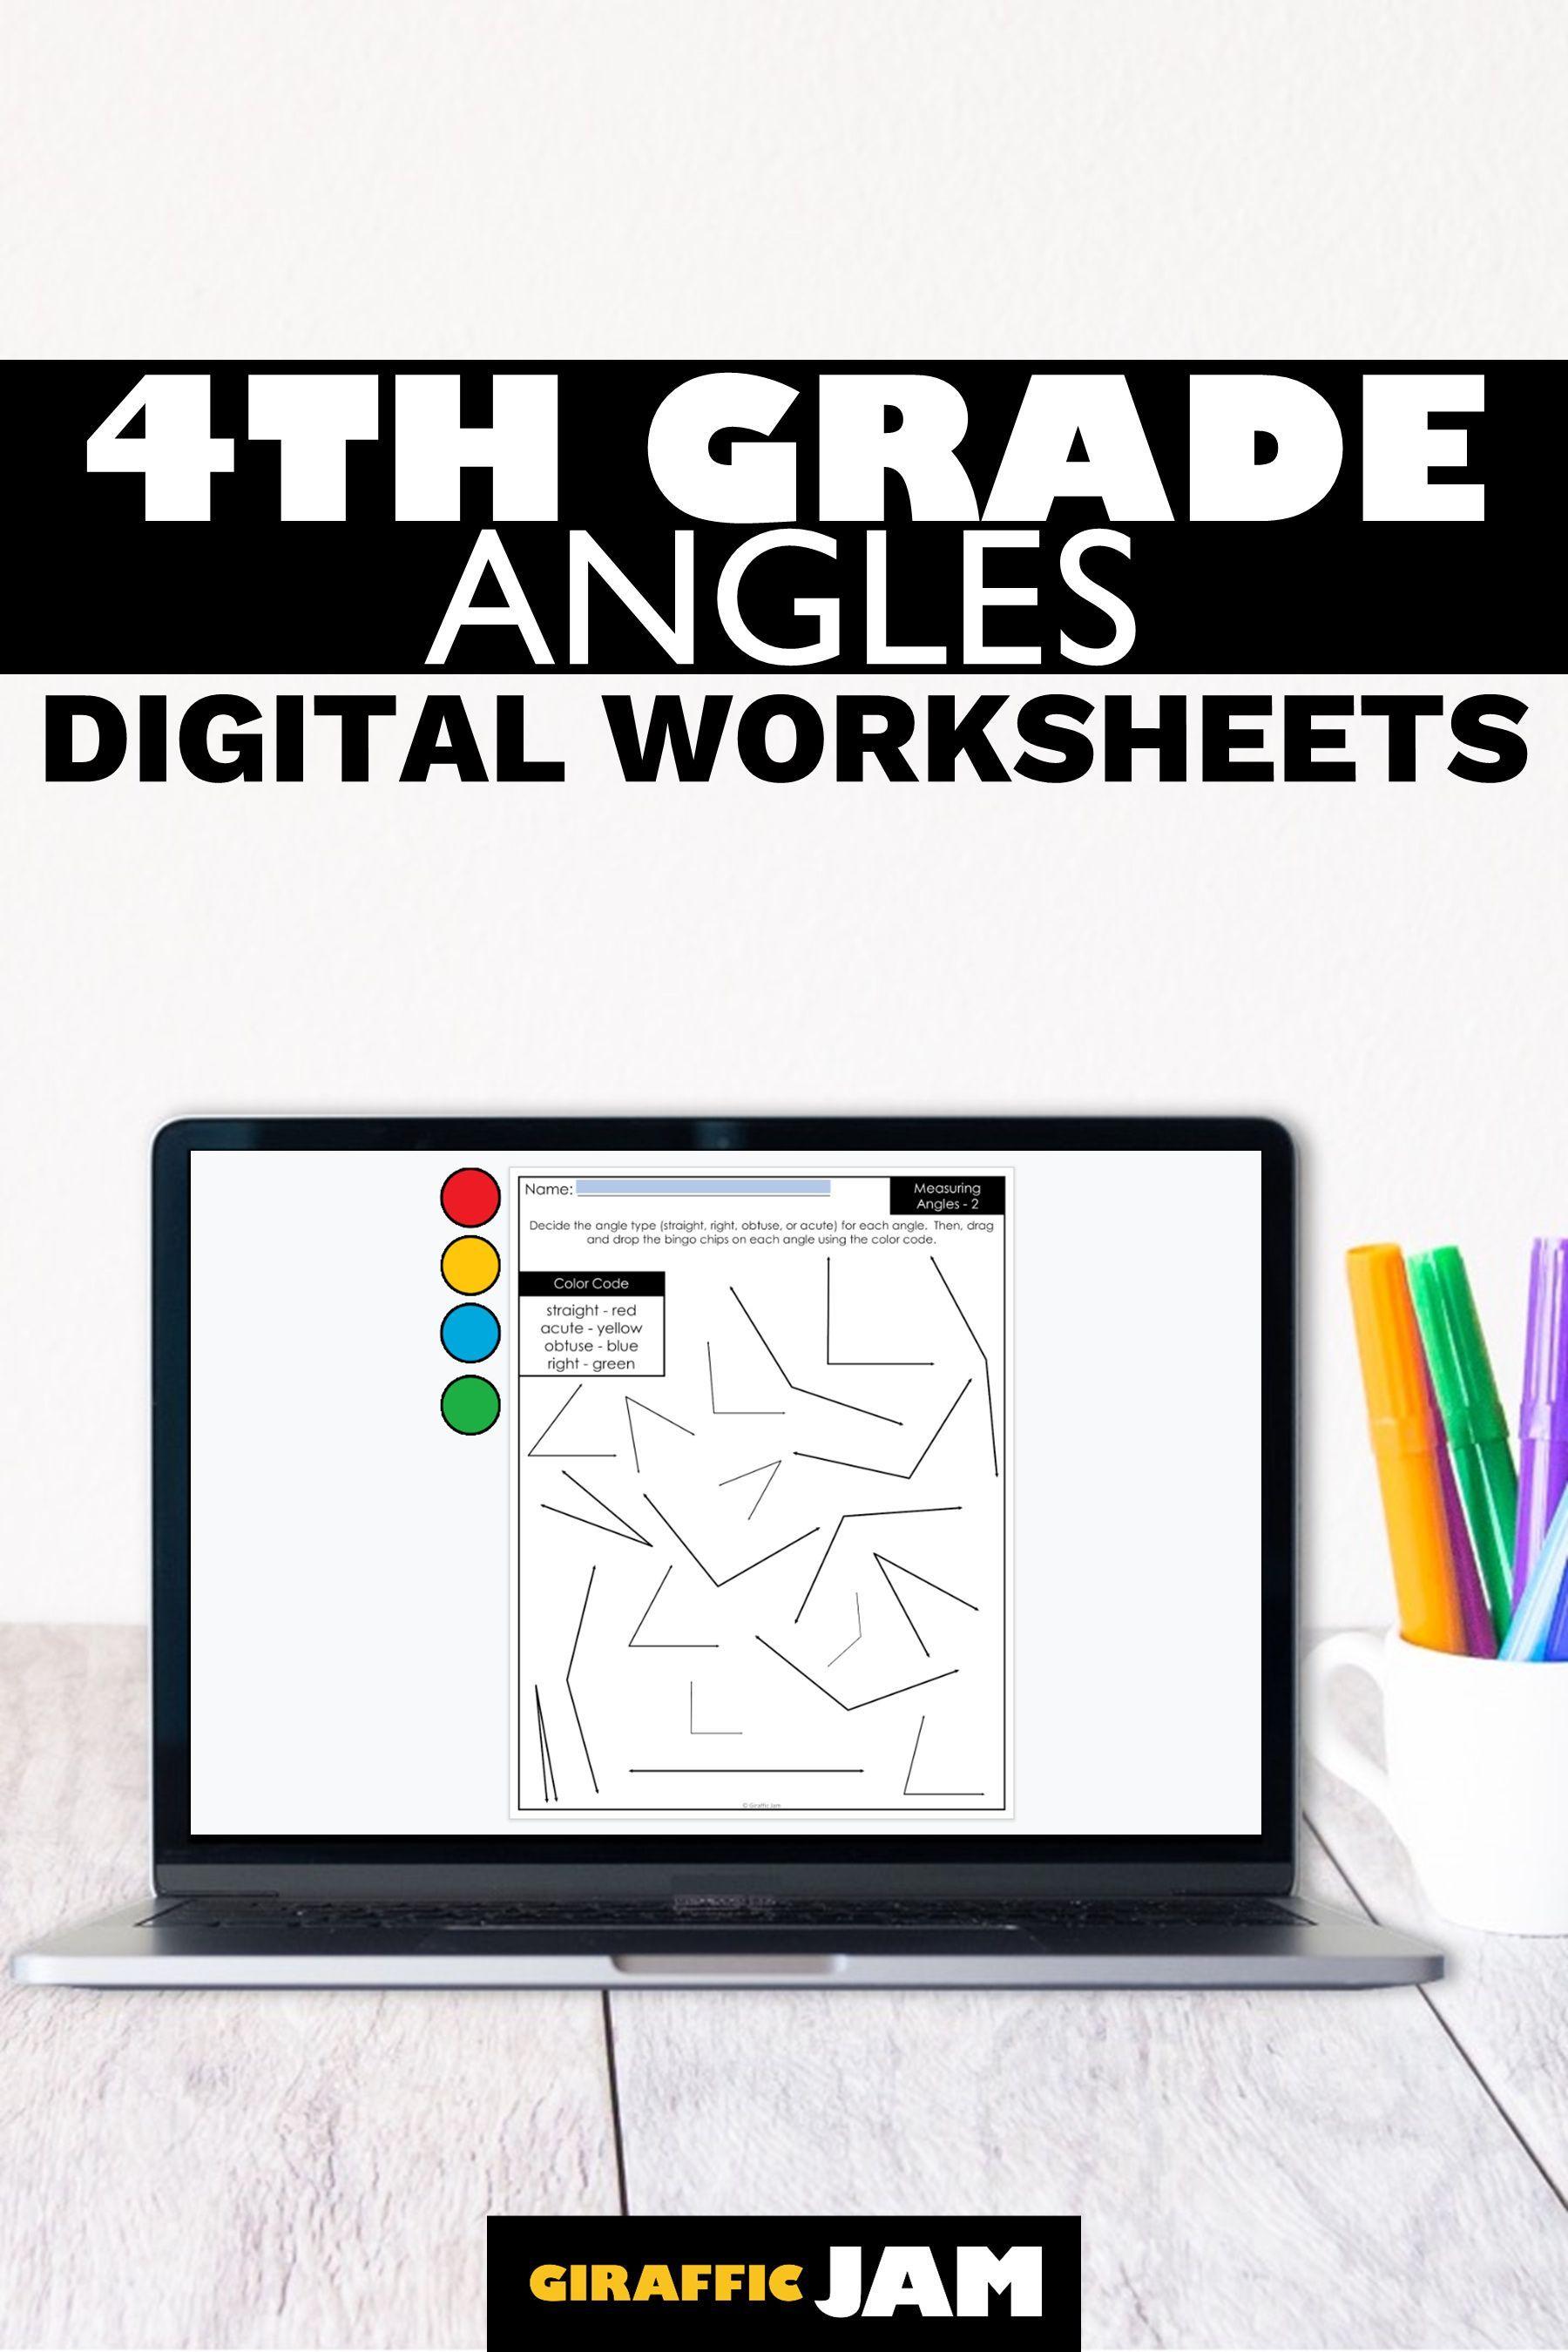 4th Grade Measurement Measurement Worksheets Angles Measuring Angles Digital Wo Google Classroom Activities 4th Grade Math Worksheets Google Classroom [ 2700 x 1800 Pixel ]